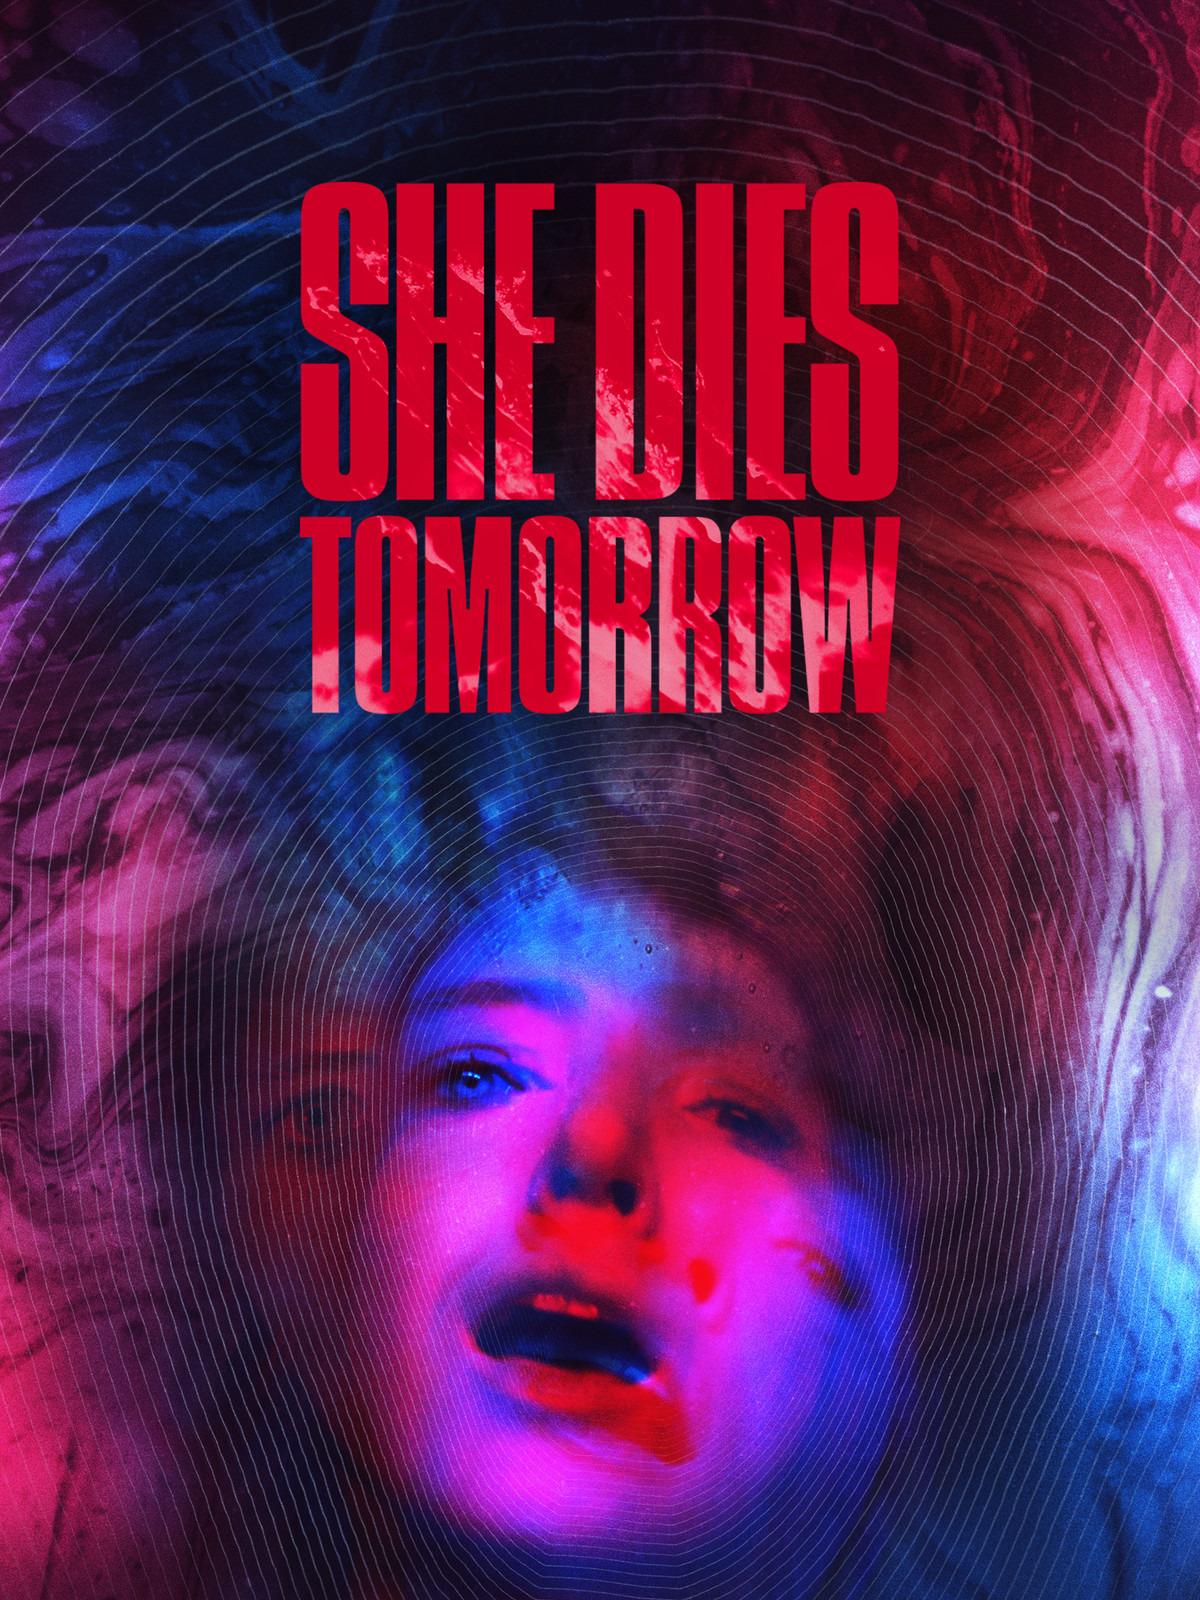 Prime Video: She Dies Tomorrow